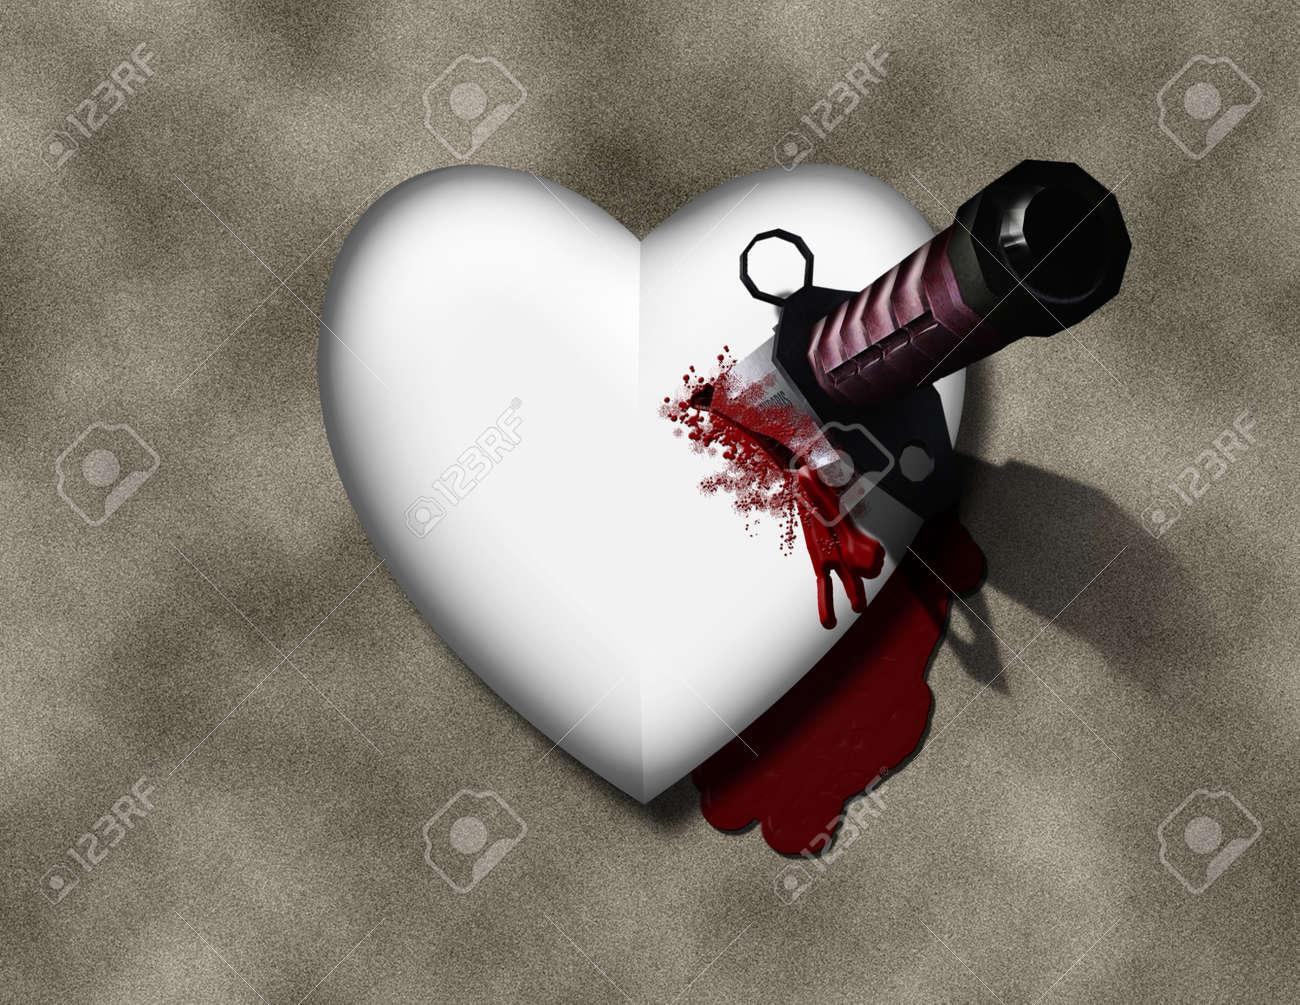 Bleeding heart with bloody knife stock photo picture and royalty bleeding heart with bloody knife stock photo 11397831 buycottarizona